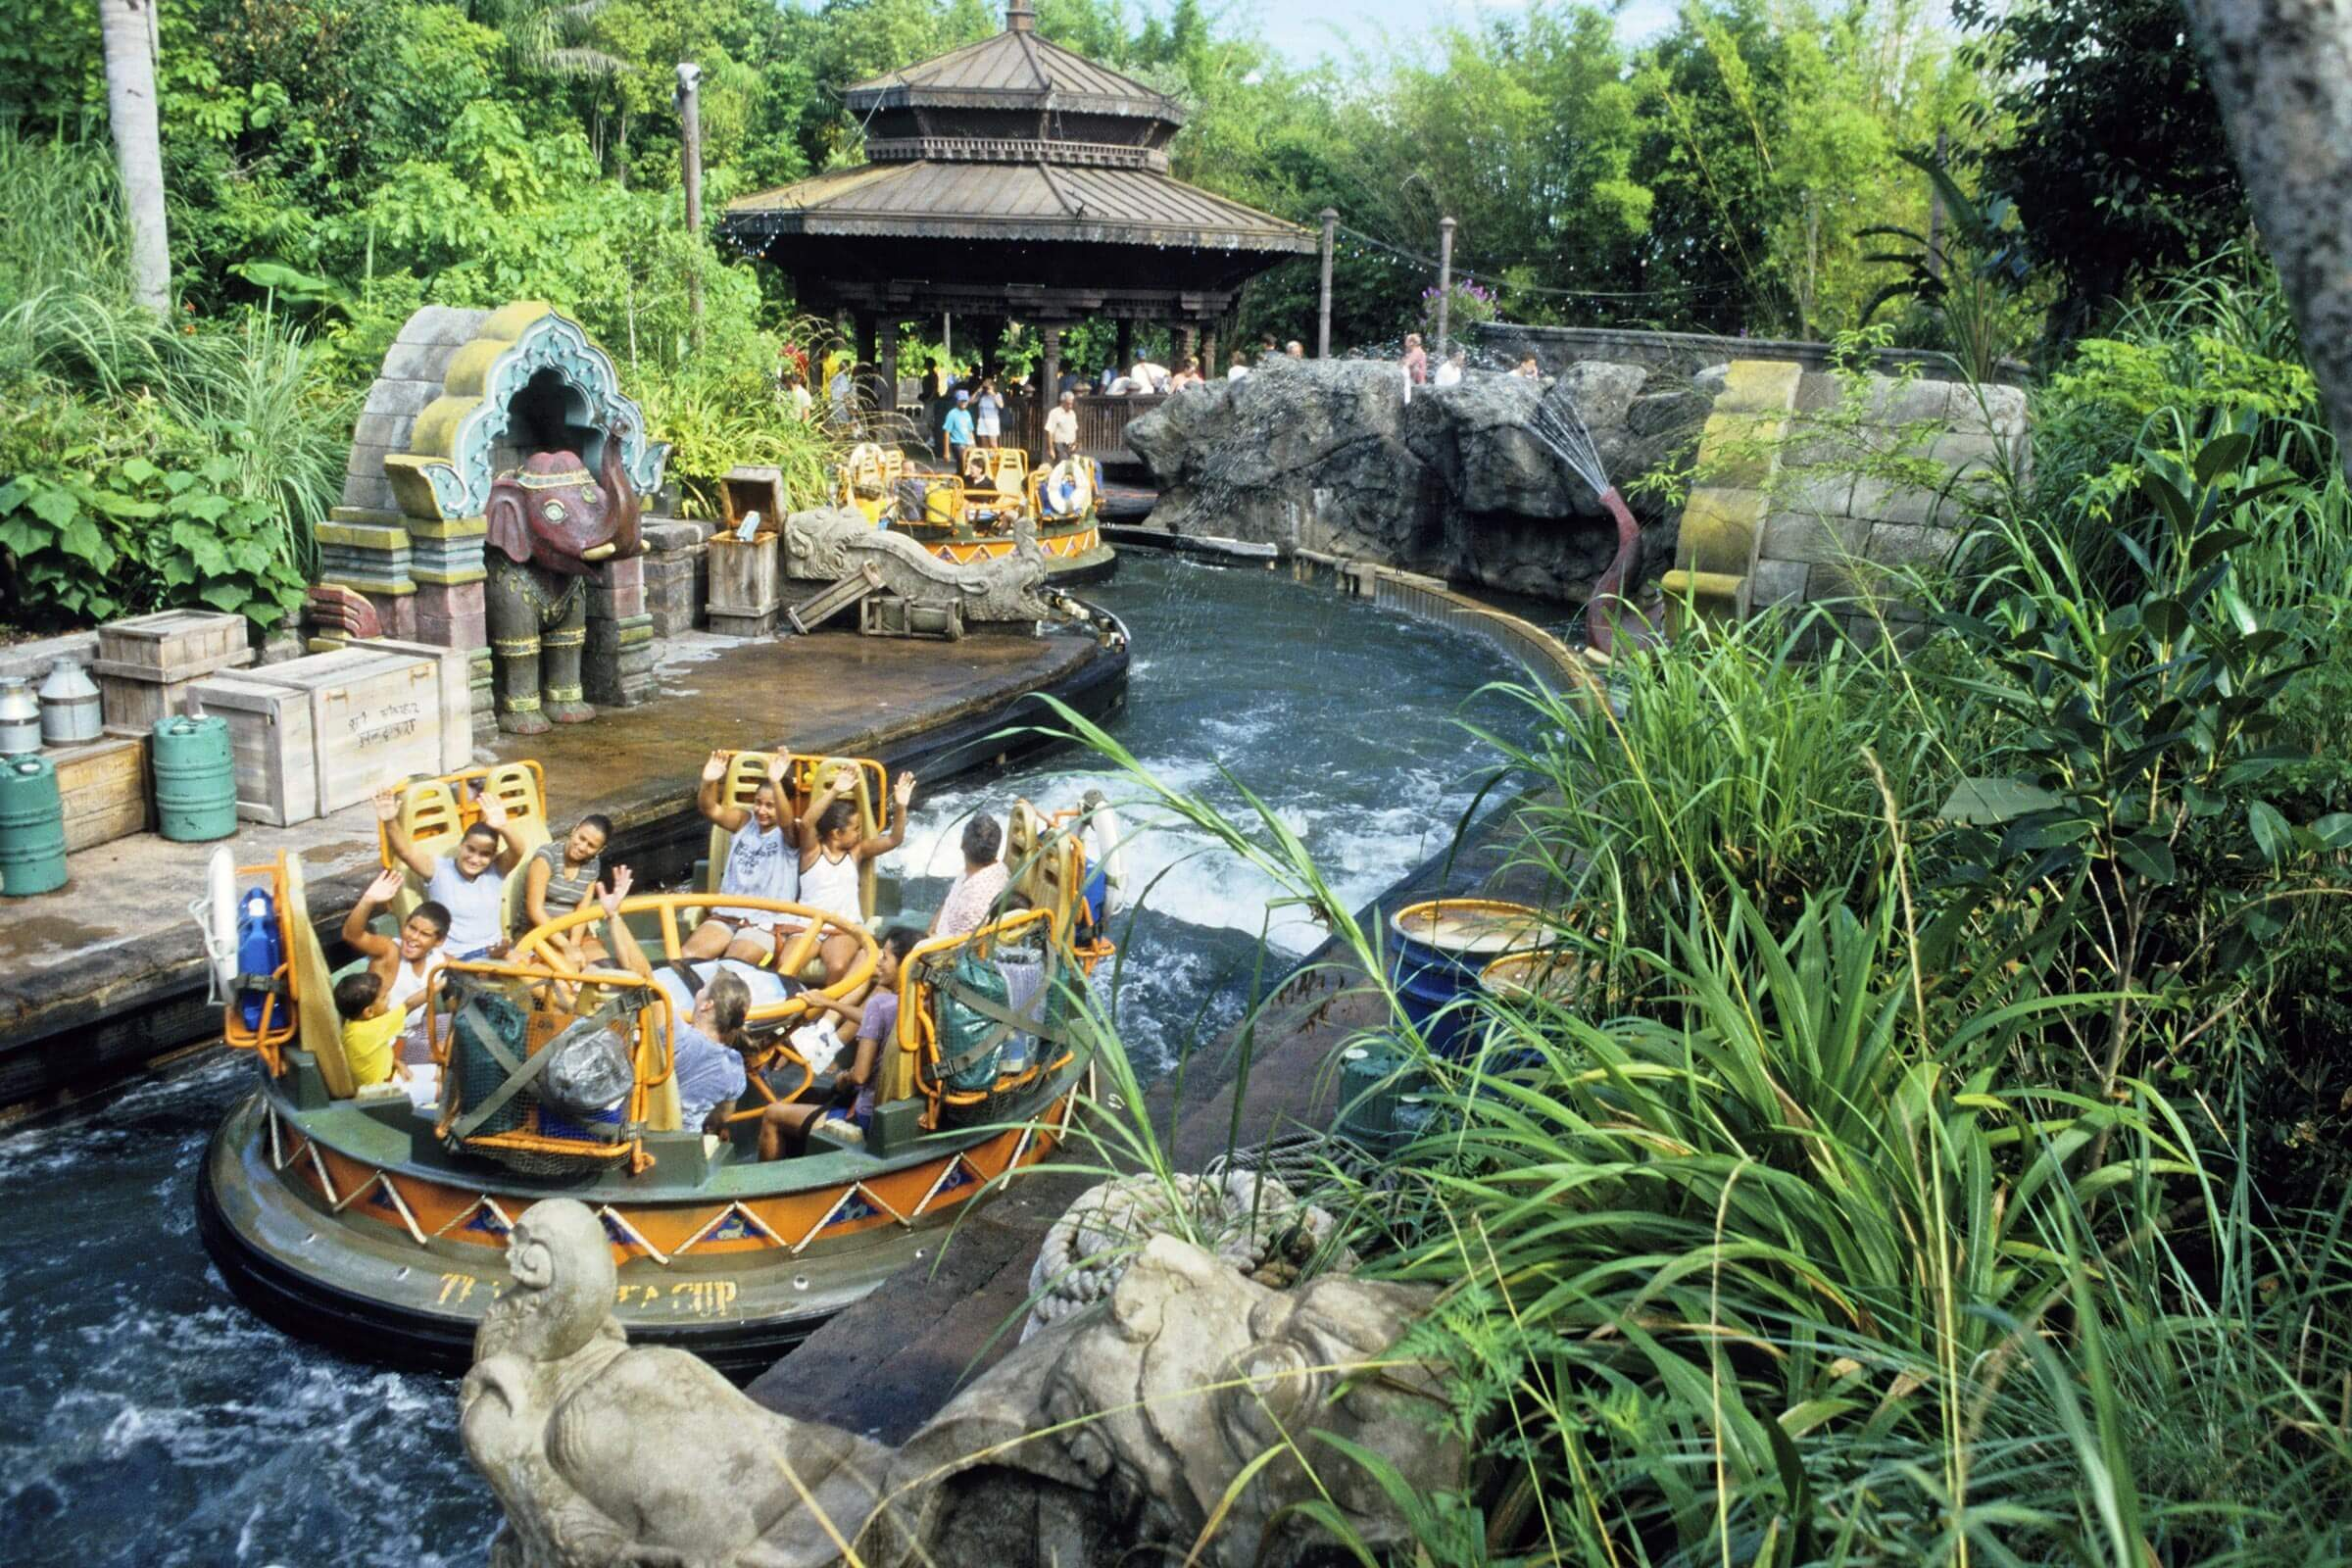 The Asian section of the Animal Kingdom at Disneyworld, Orlando, Florida, America